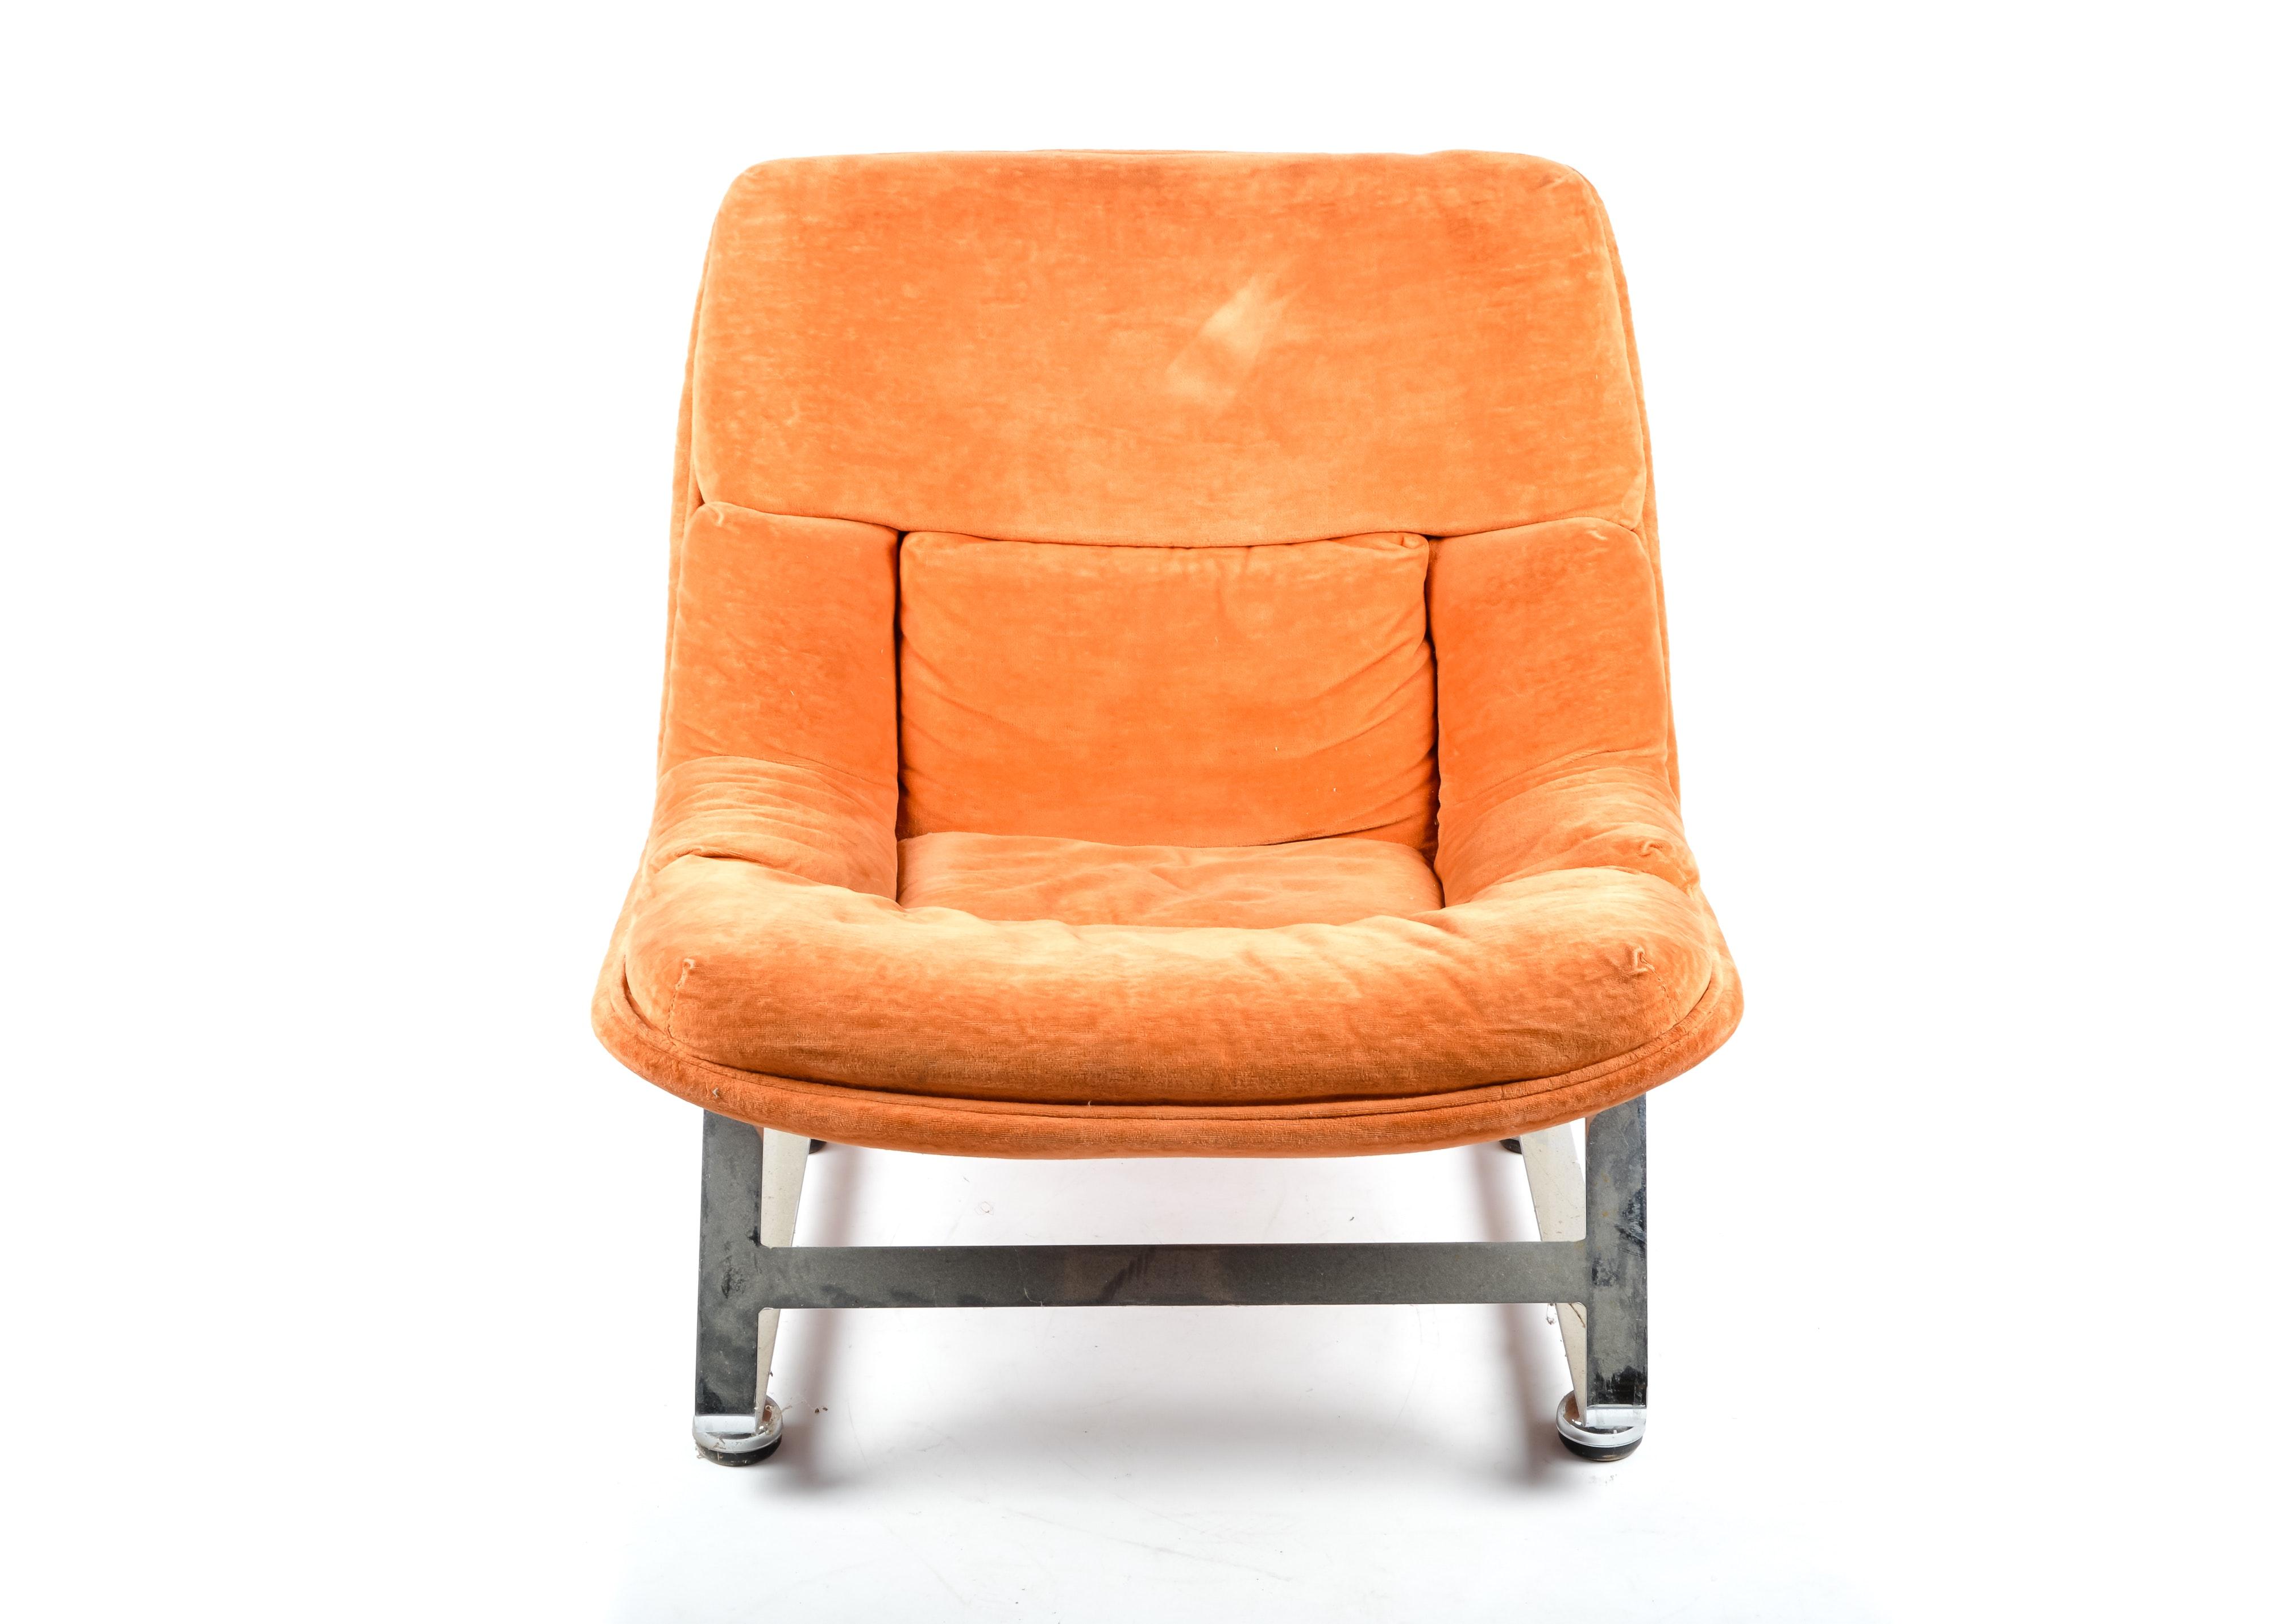 Vintage Tufted Orange Velour Chair on Chrome Base ...  sc 1 st  EBTH.com & Vintage Tufted Orange Velour Chair on Chrome Base : EBTH